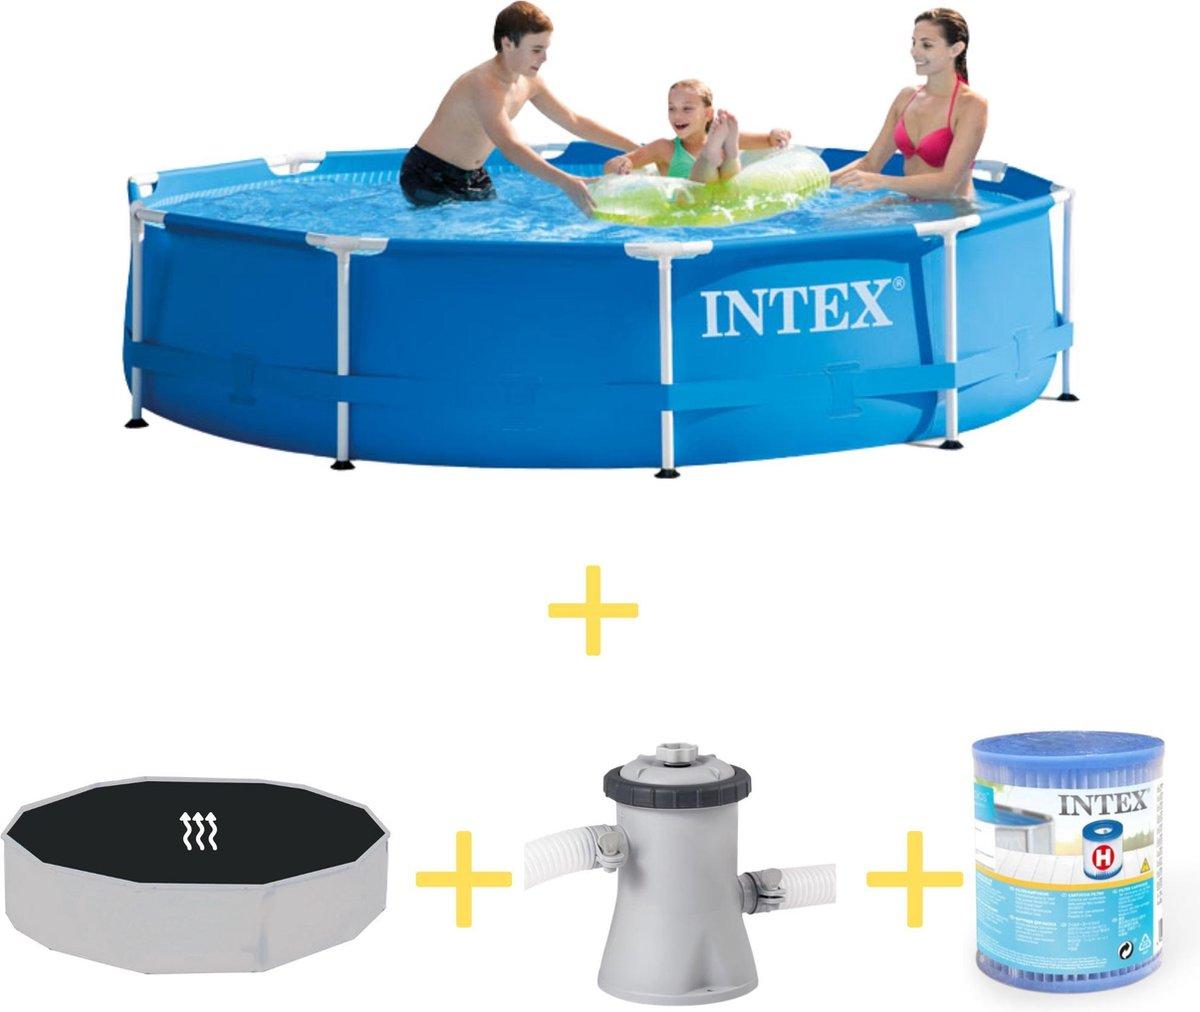 Intex Zwembad - Metal Frame - 305 x 76 cm - Inclusief Solarzeil, Filterpomp & Filter